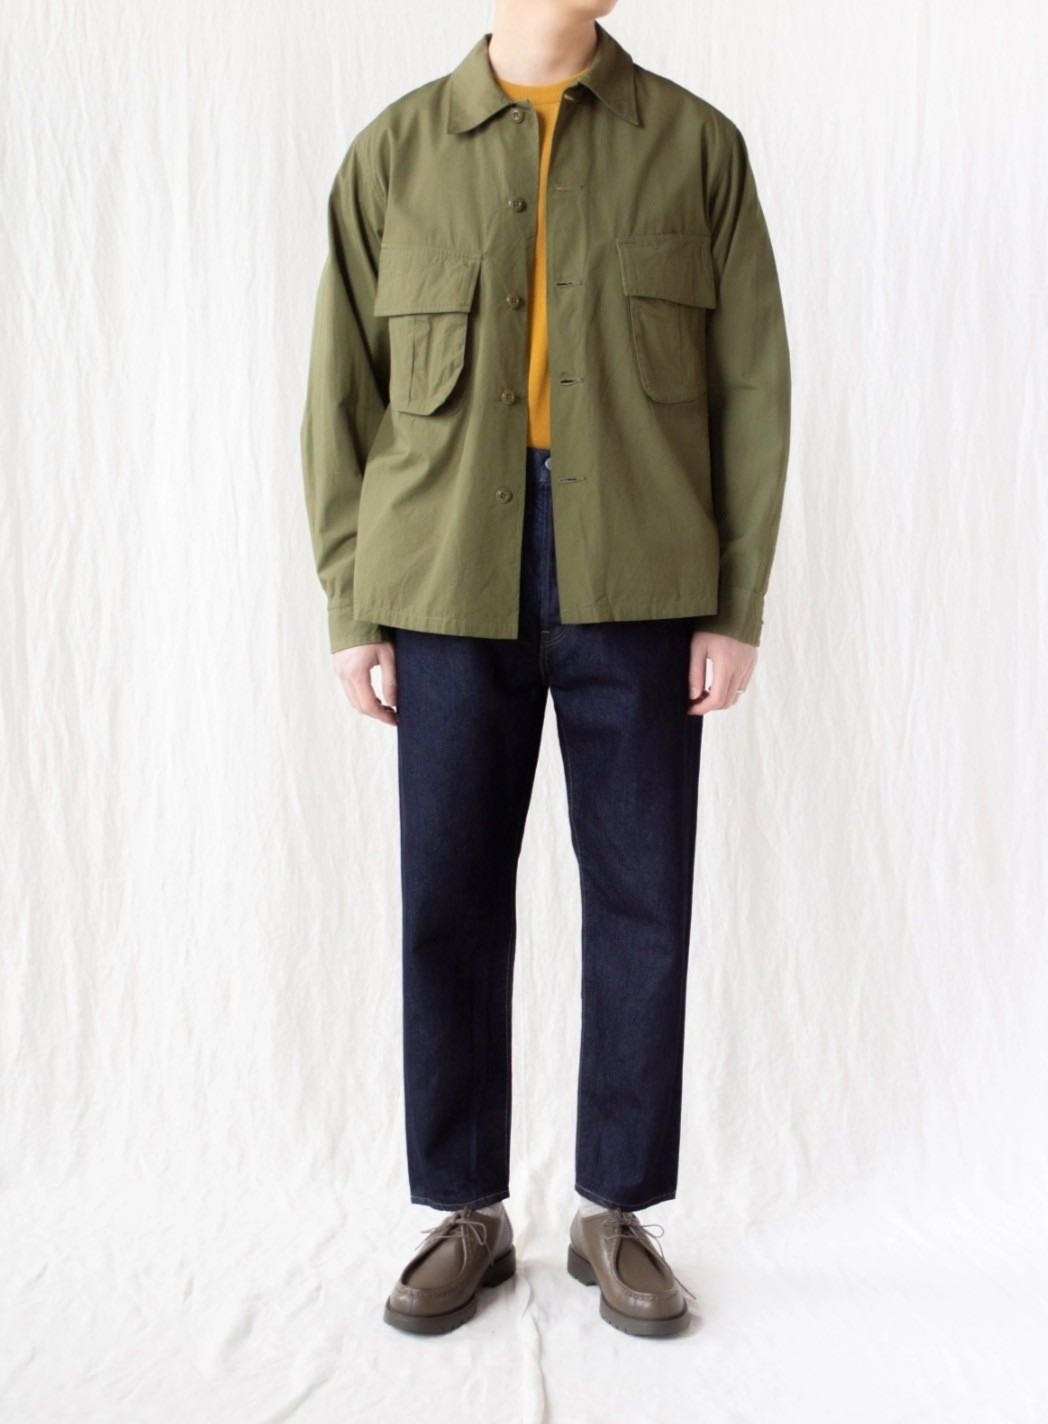 Jean brut loose tapered de la marque Hatski porté taille haute